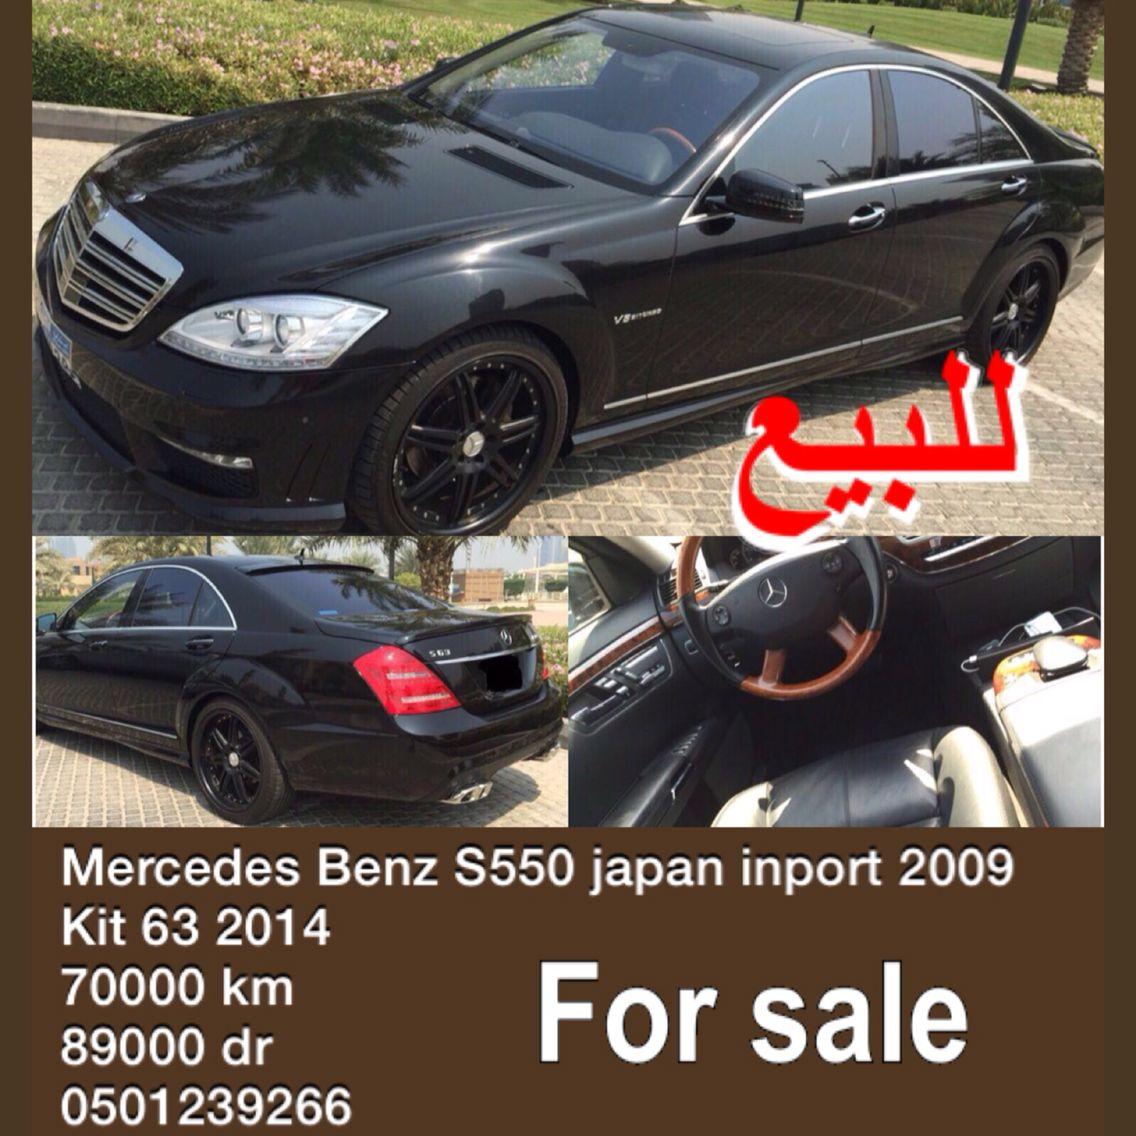 للبيع مرسيدس Mercedes Benz S550 Japan Inport 2009 Kit 63 2014 70000 Km 89000 Dr 0501239266 اعلان مميز مرسيدس للب Mercedes Benz S550 Benz S550 Mercedes Benz